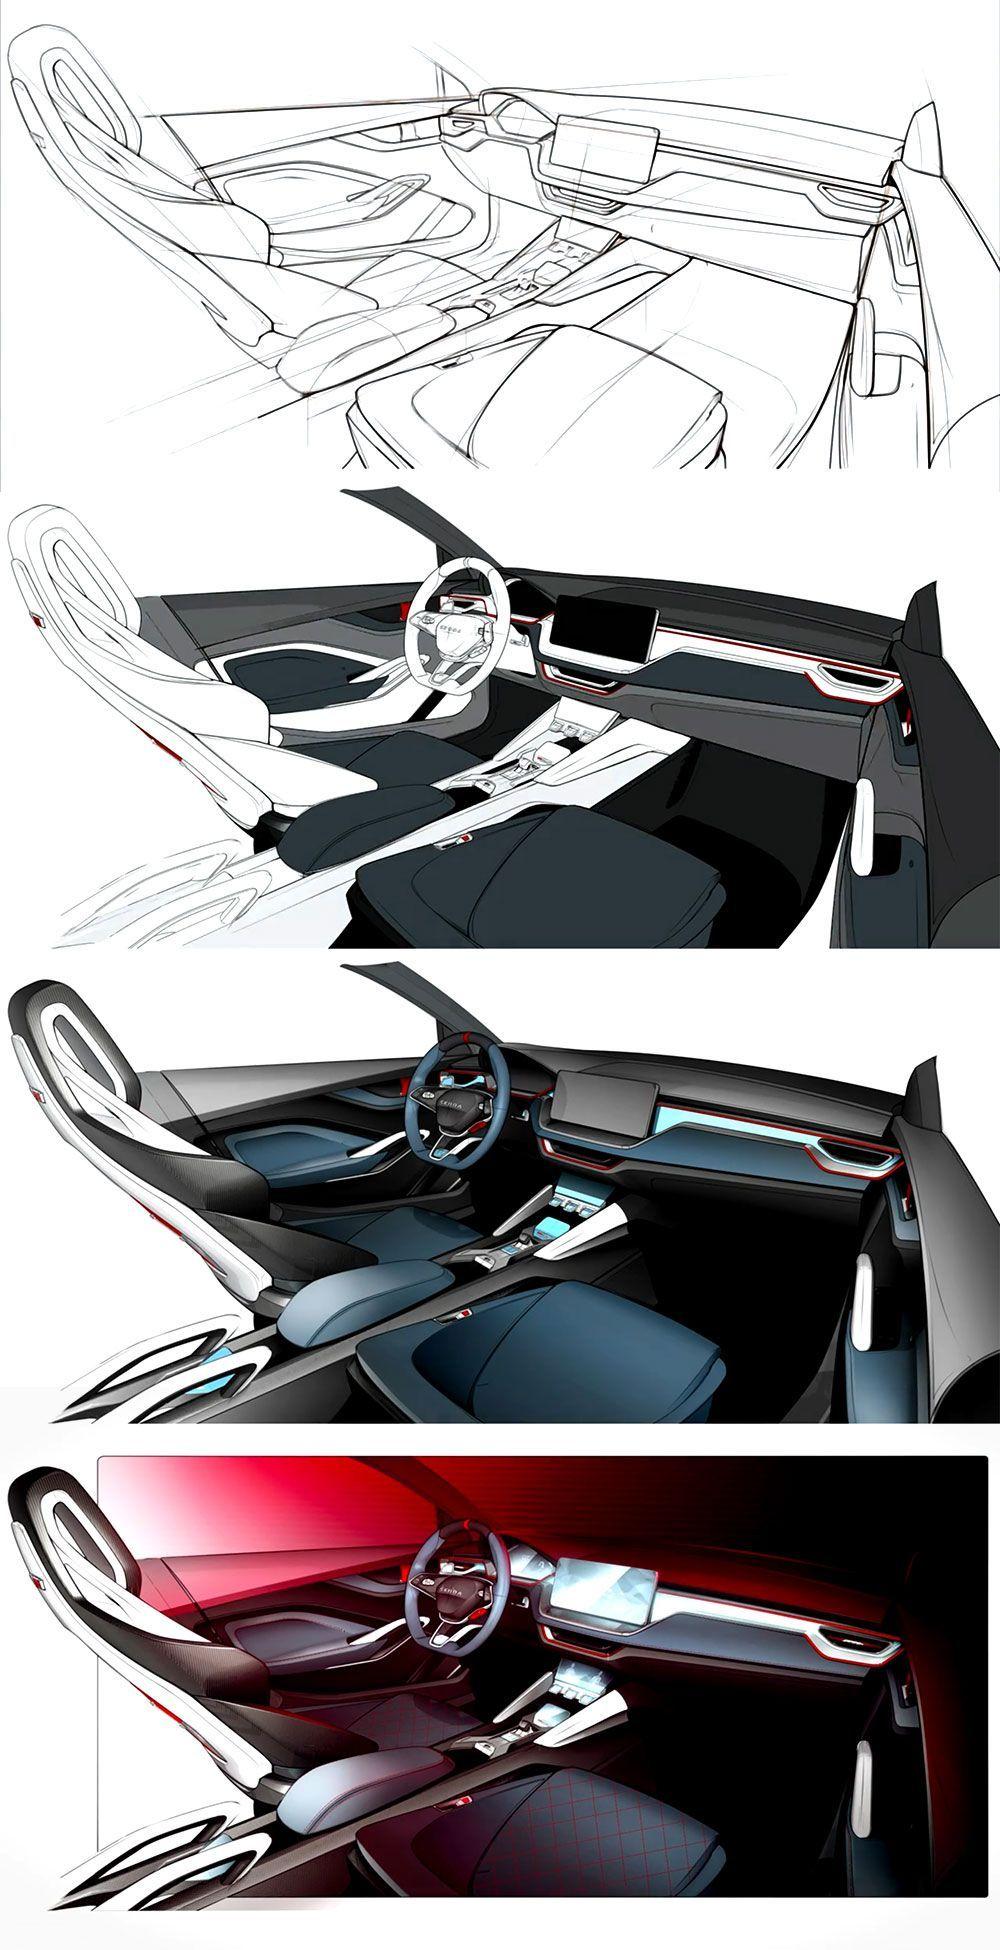 Interior design sketch of the škoda vision rs concept skoda cardesign designsketch carinterior conceptcar parismotorshow carbodydesign